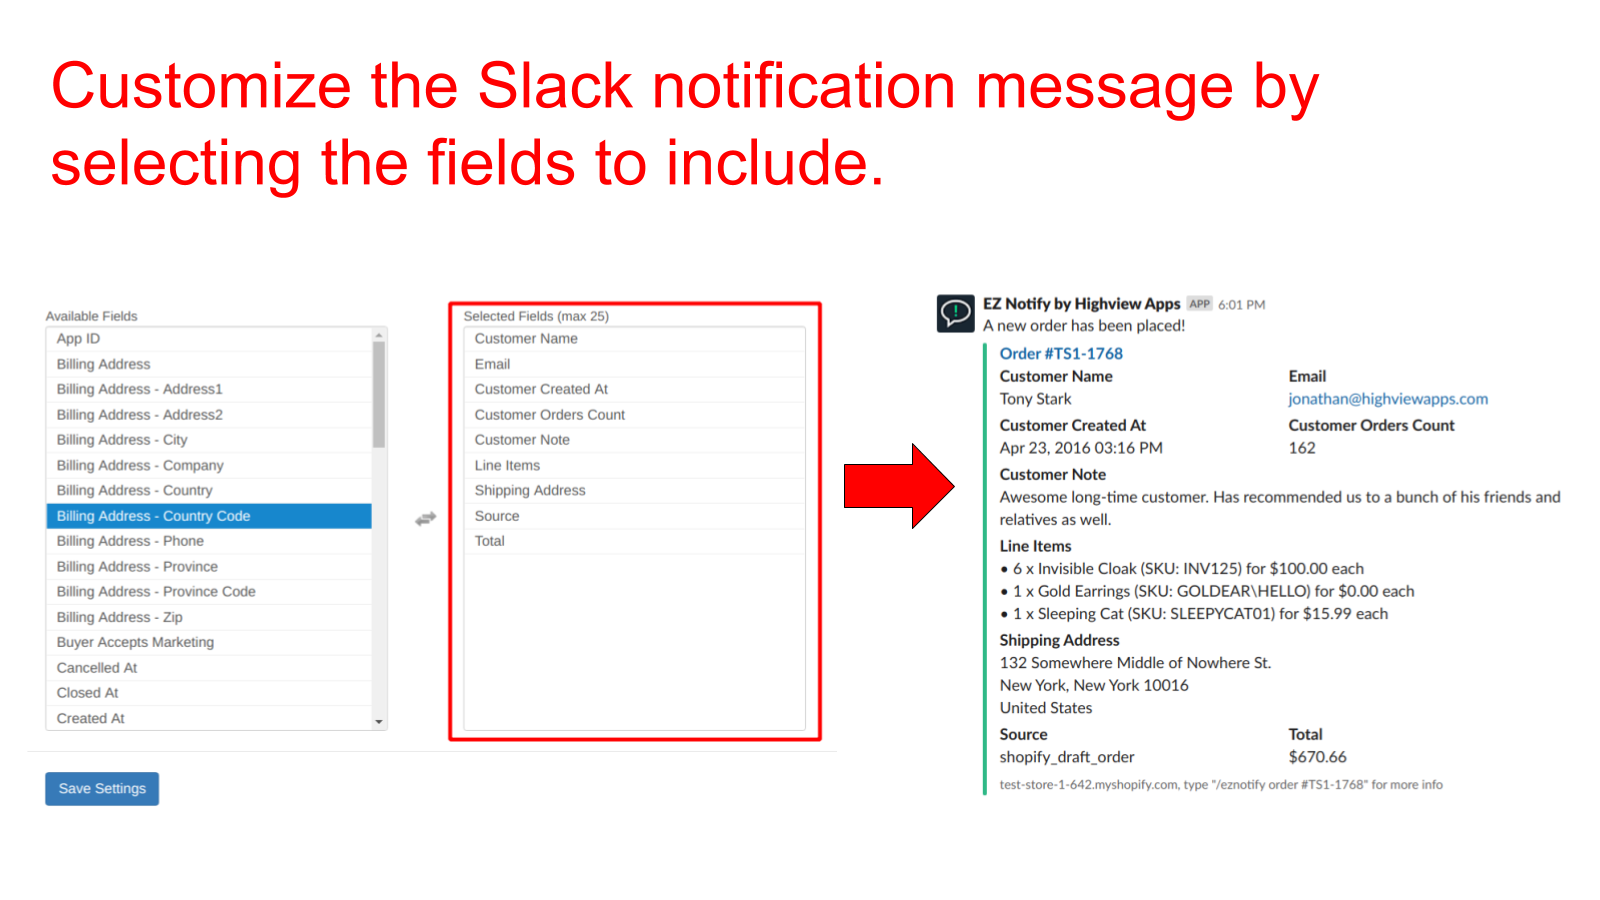 EZ Notify - Shopify Slack Integration - Custom Slack Notification Message